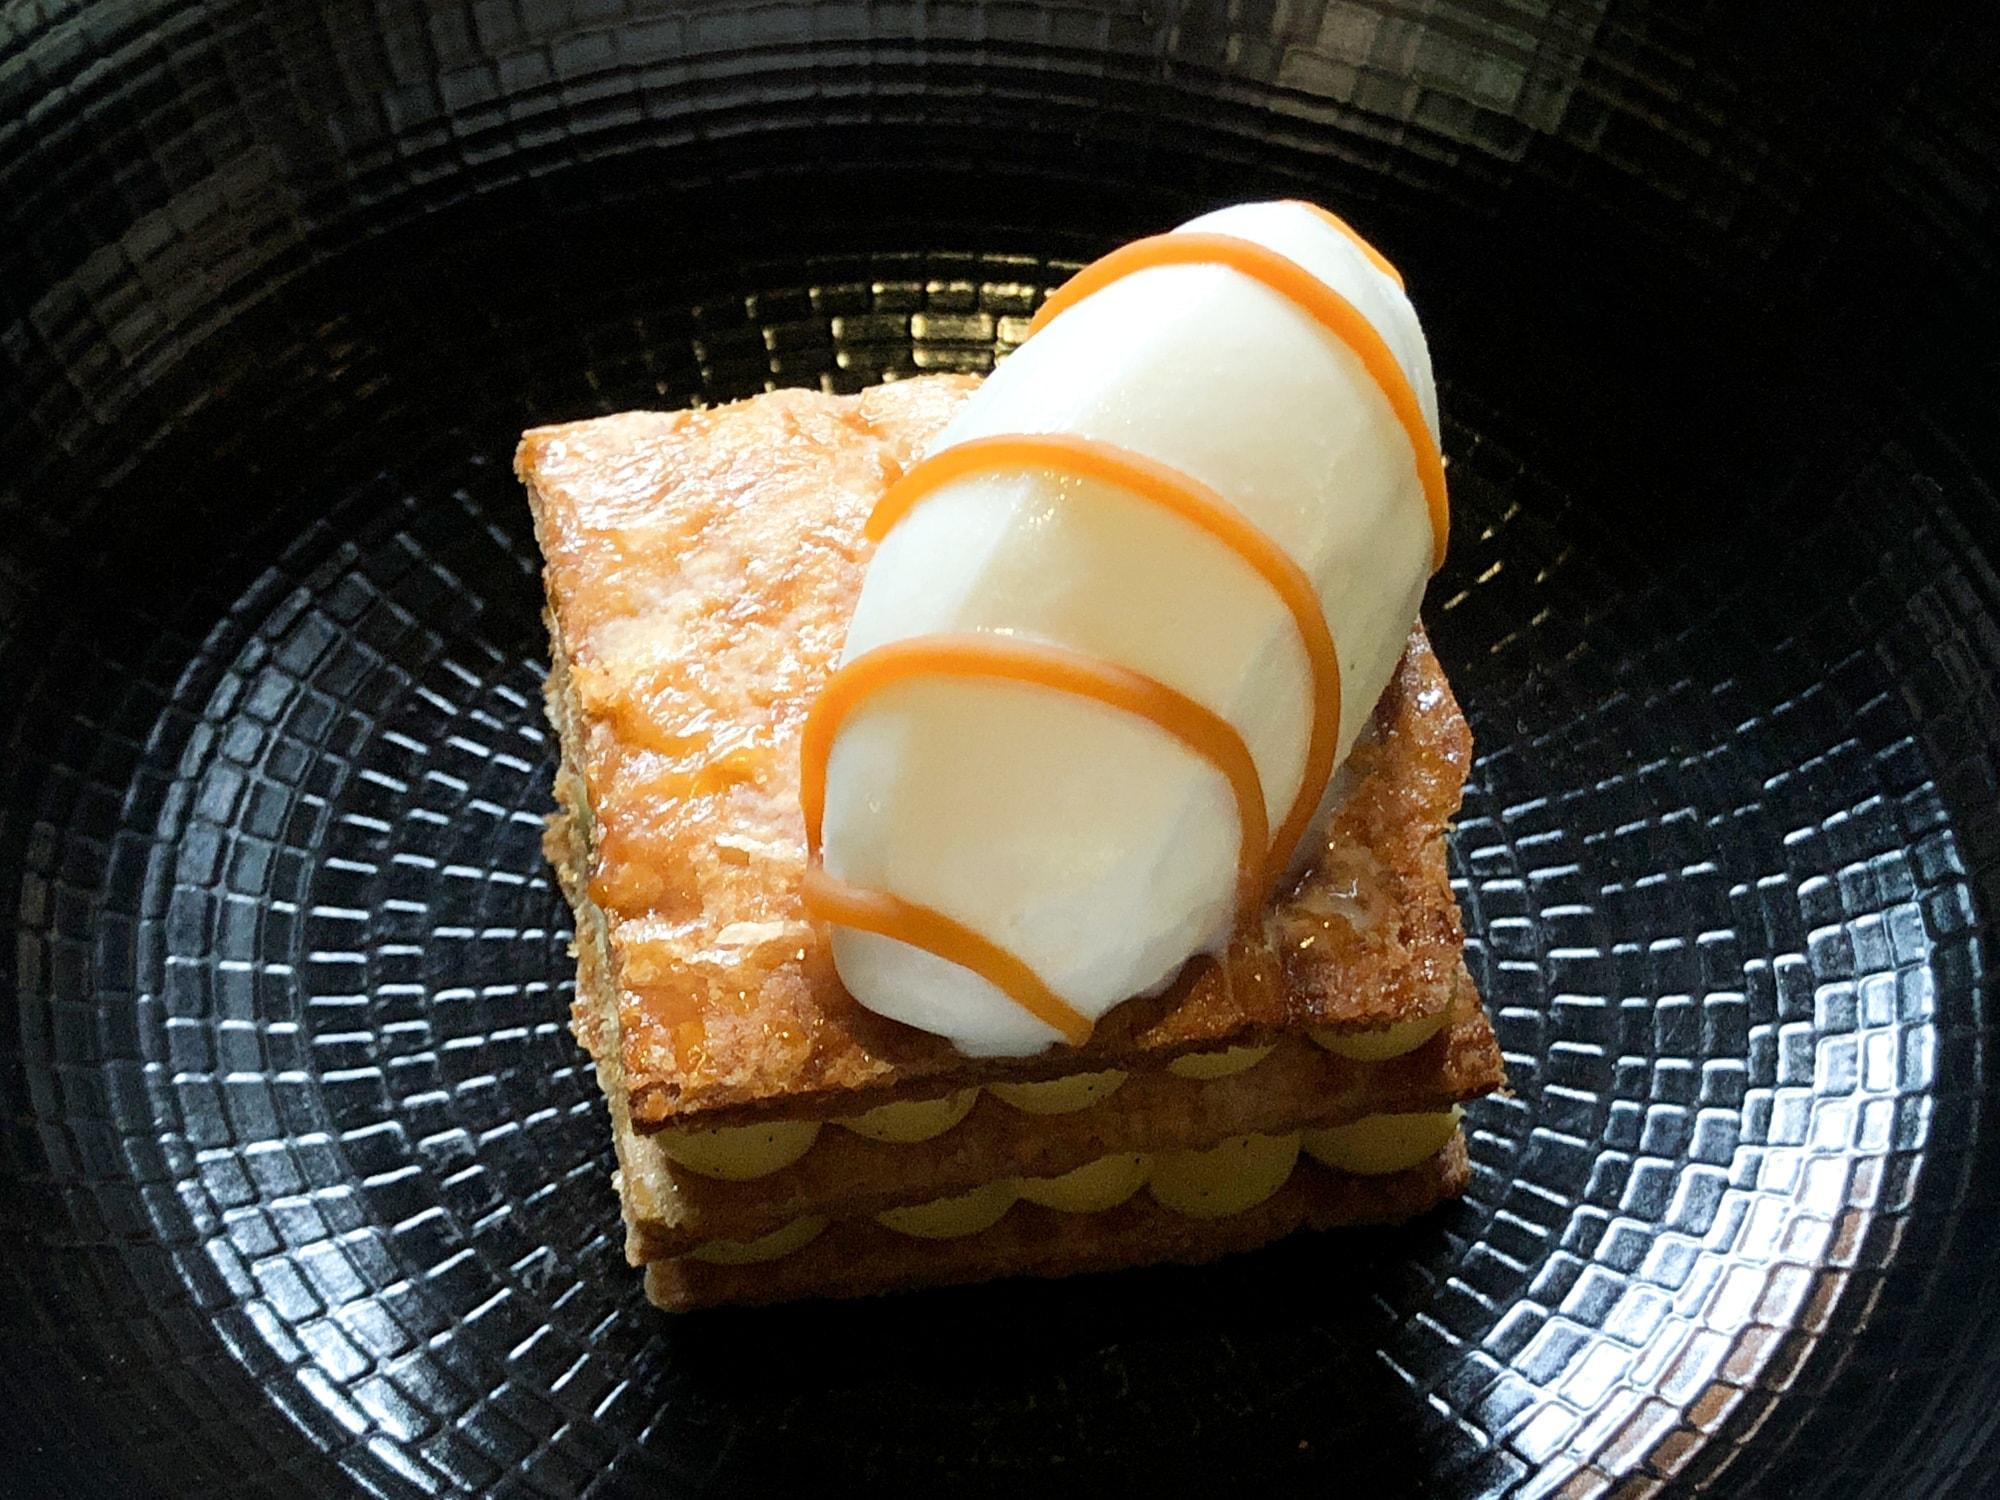 Dessert at Sud 777